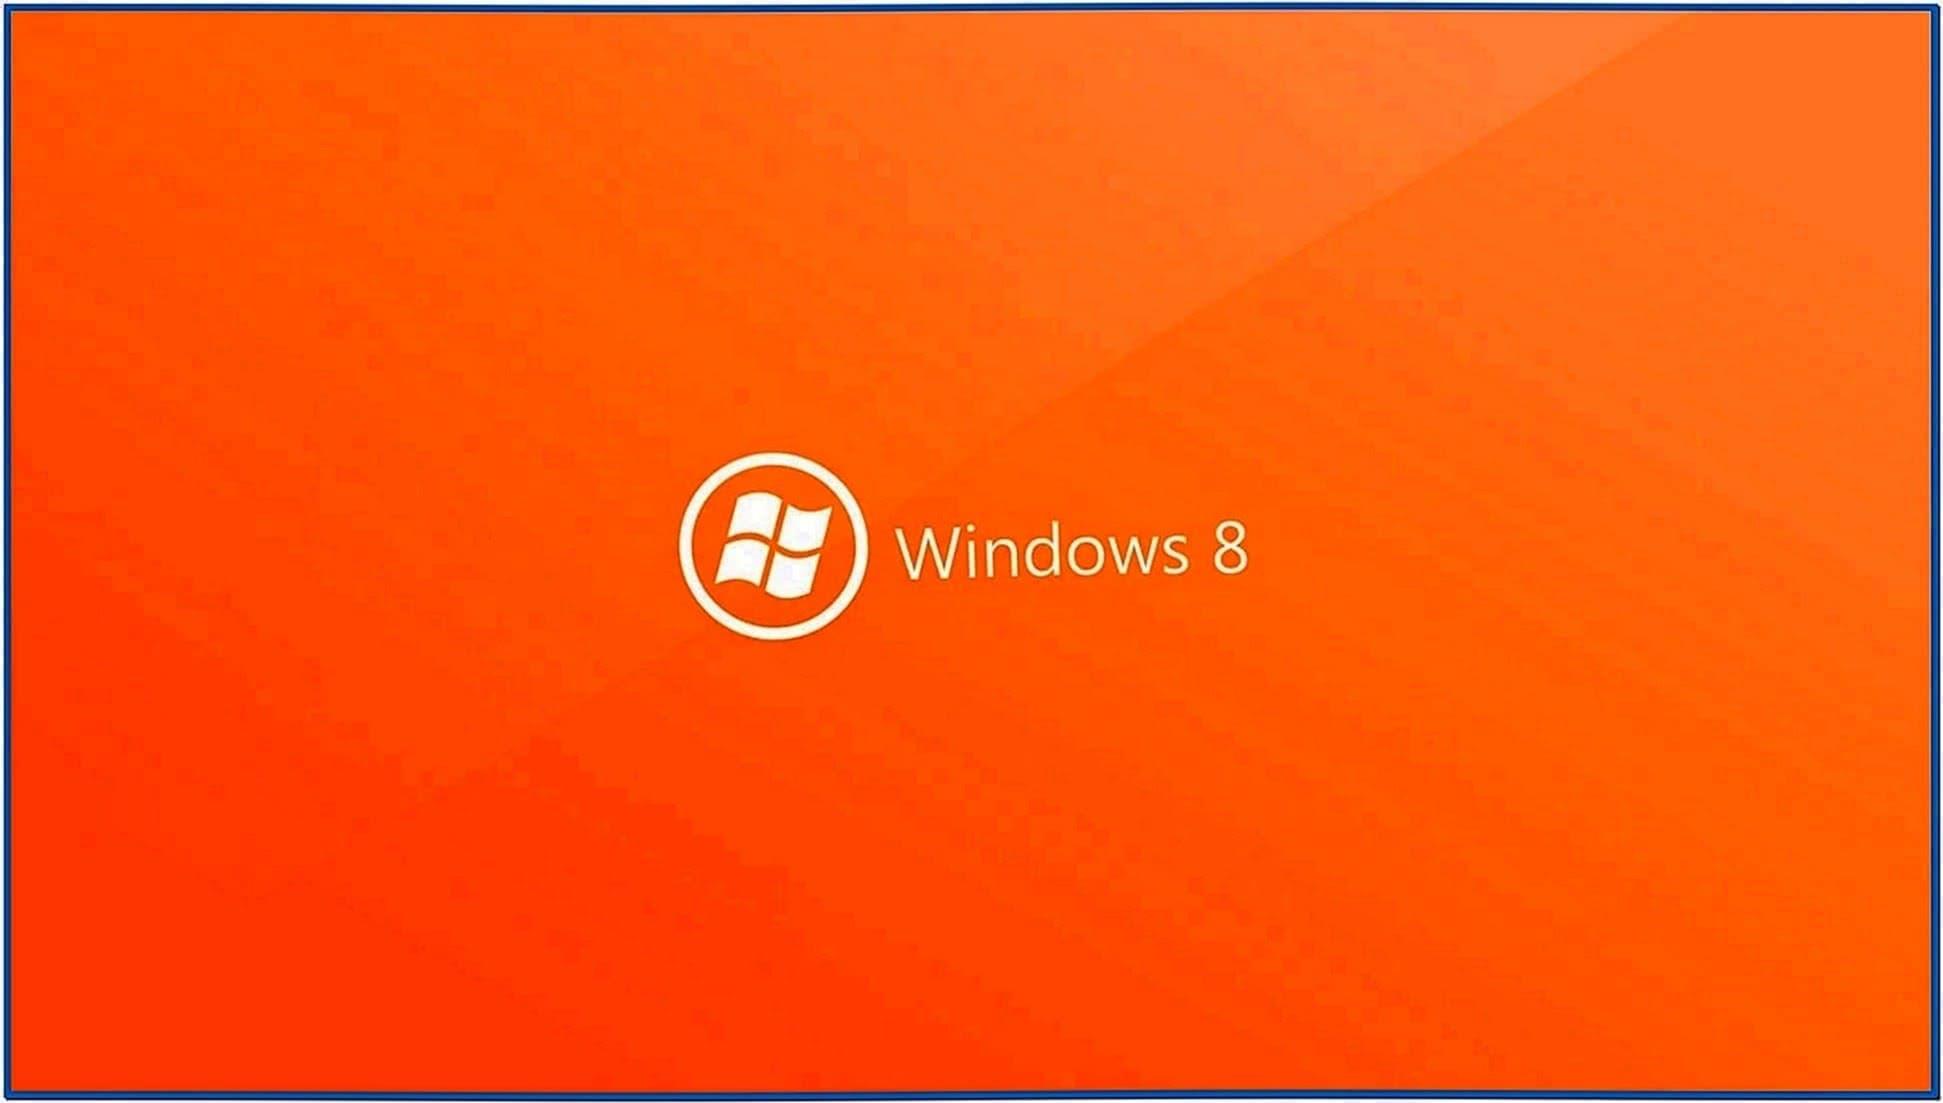 Cool animated screensavers windows 8 - Download free